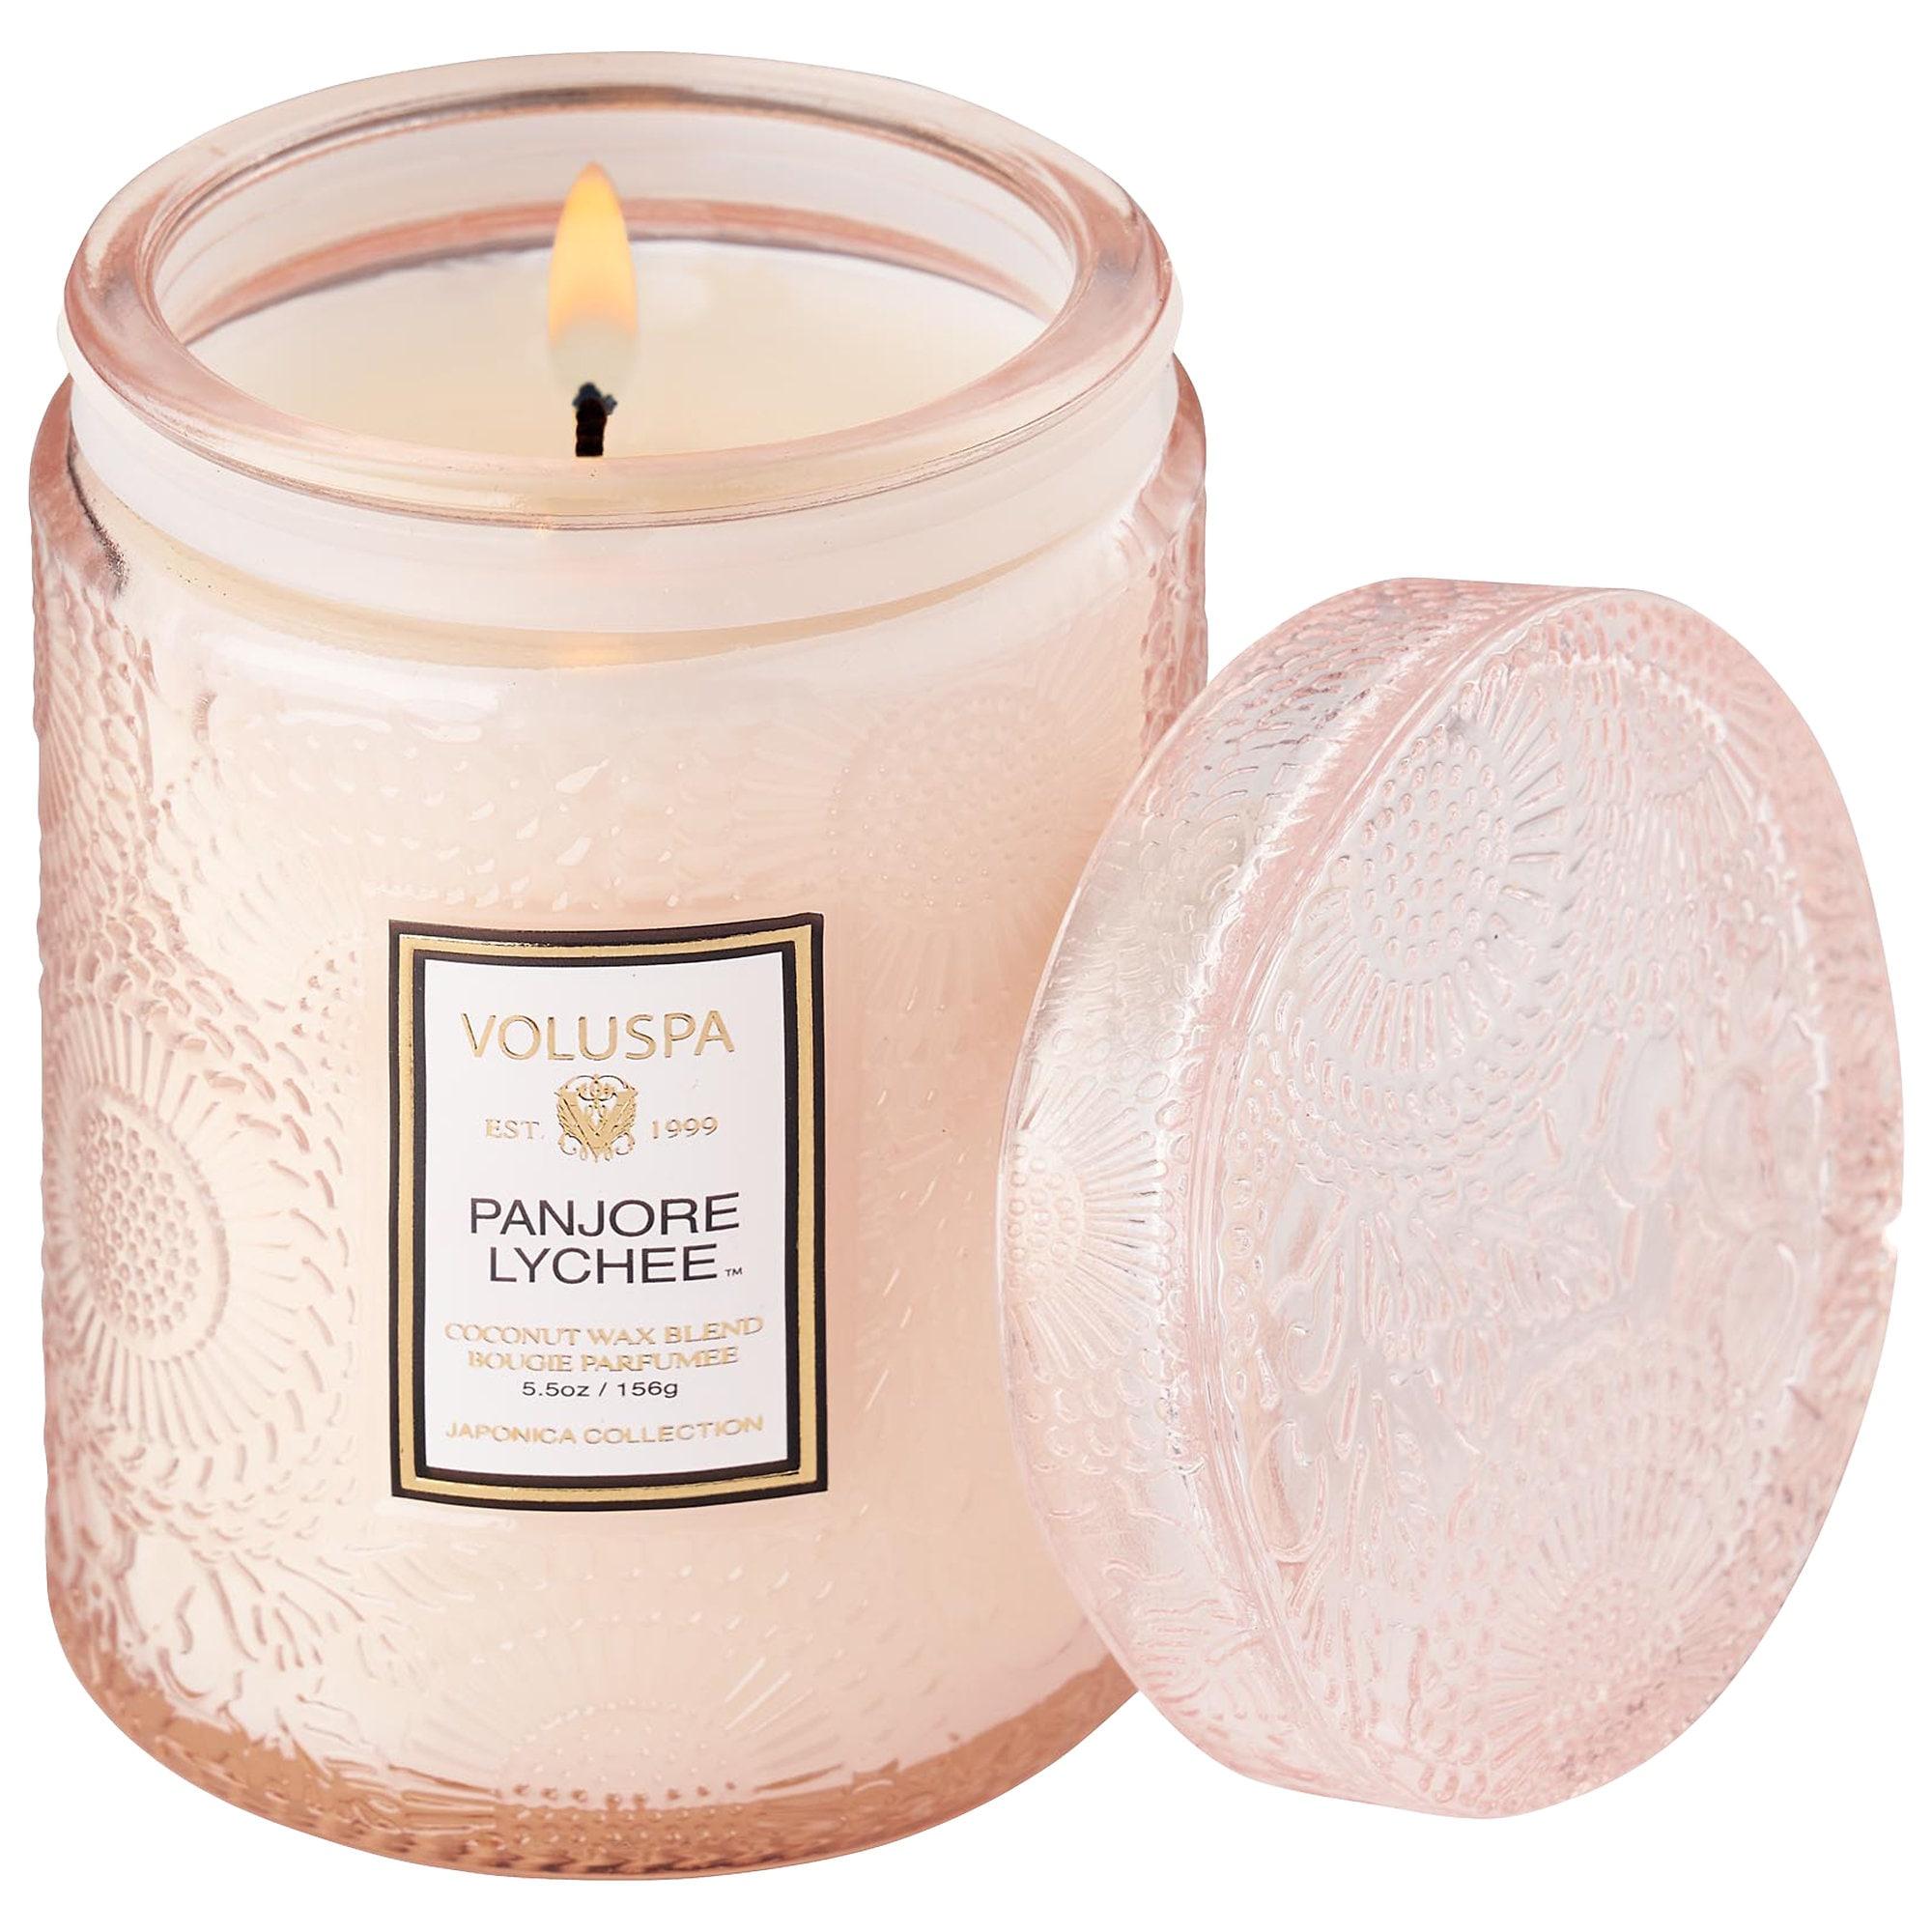 VOLUSPA - Panjore Lychee Glass Jar Candle